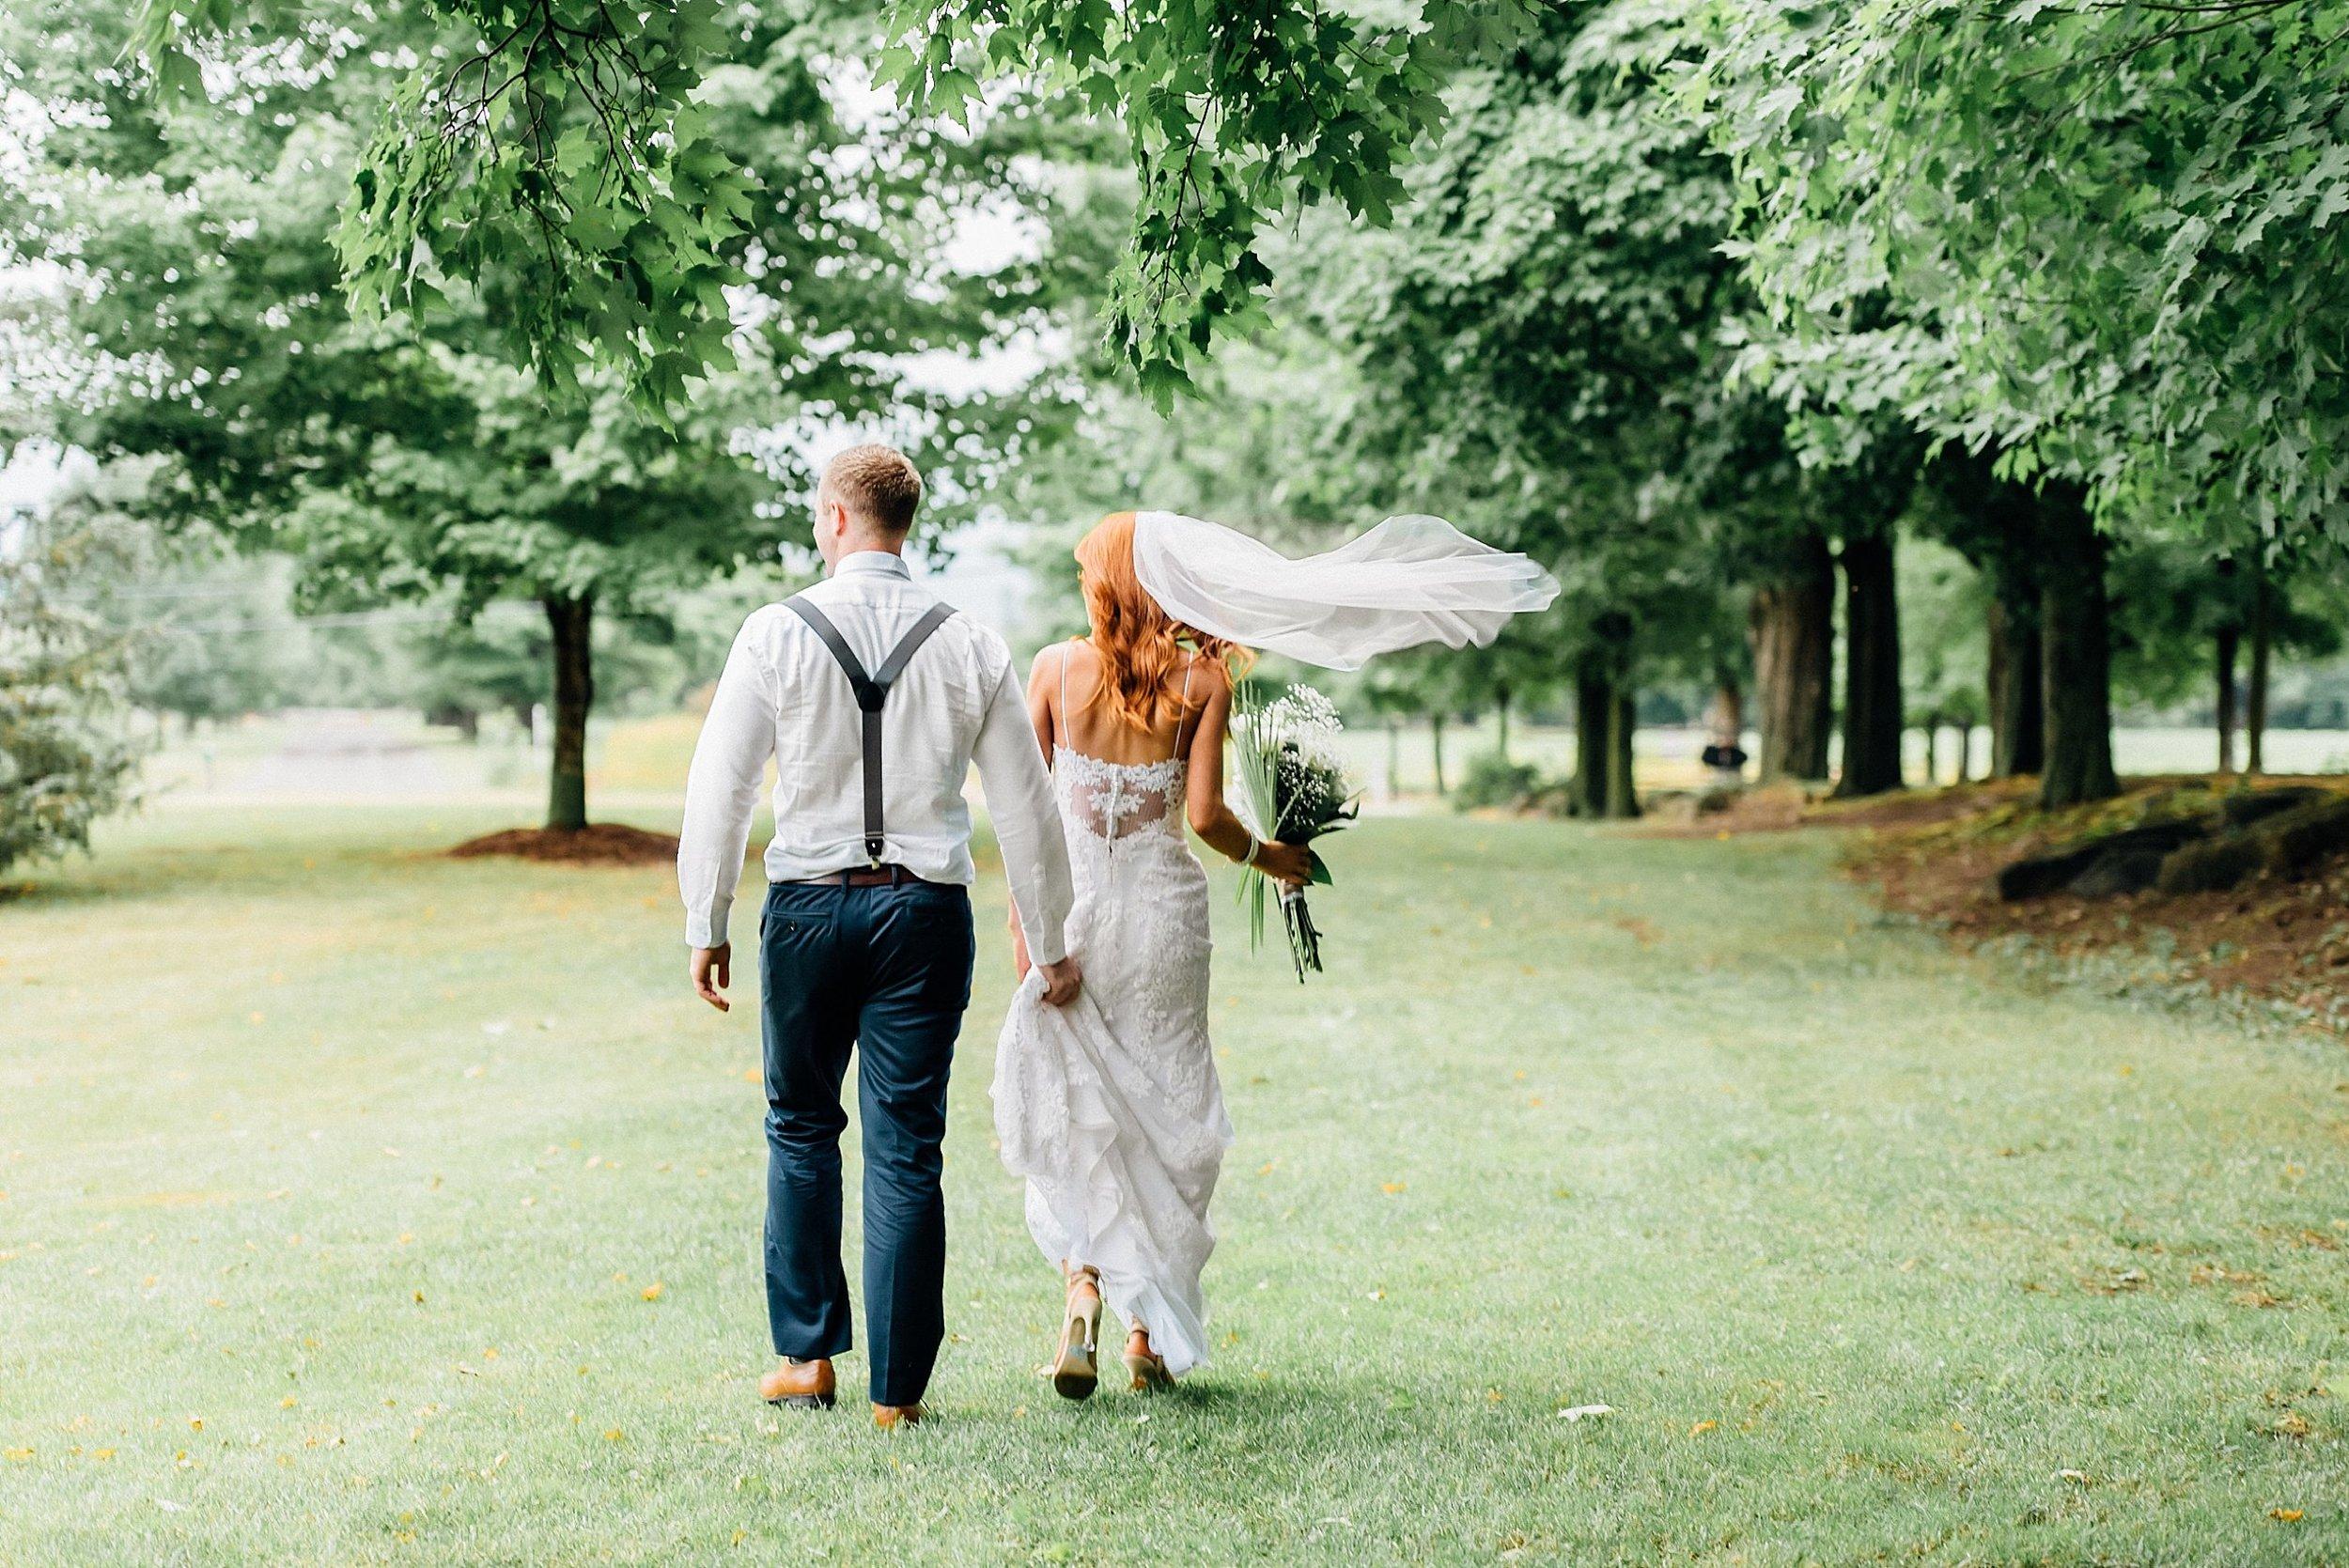 Ottawa Wedding Photographer - Stanley's Olde Maple Lane Barn Wedding - Ali & Batoul Photography_0040.jpg